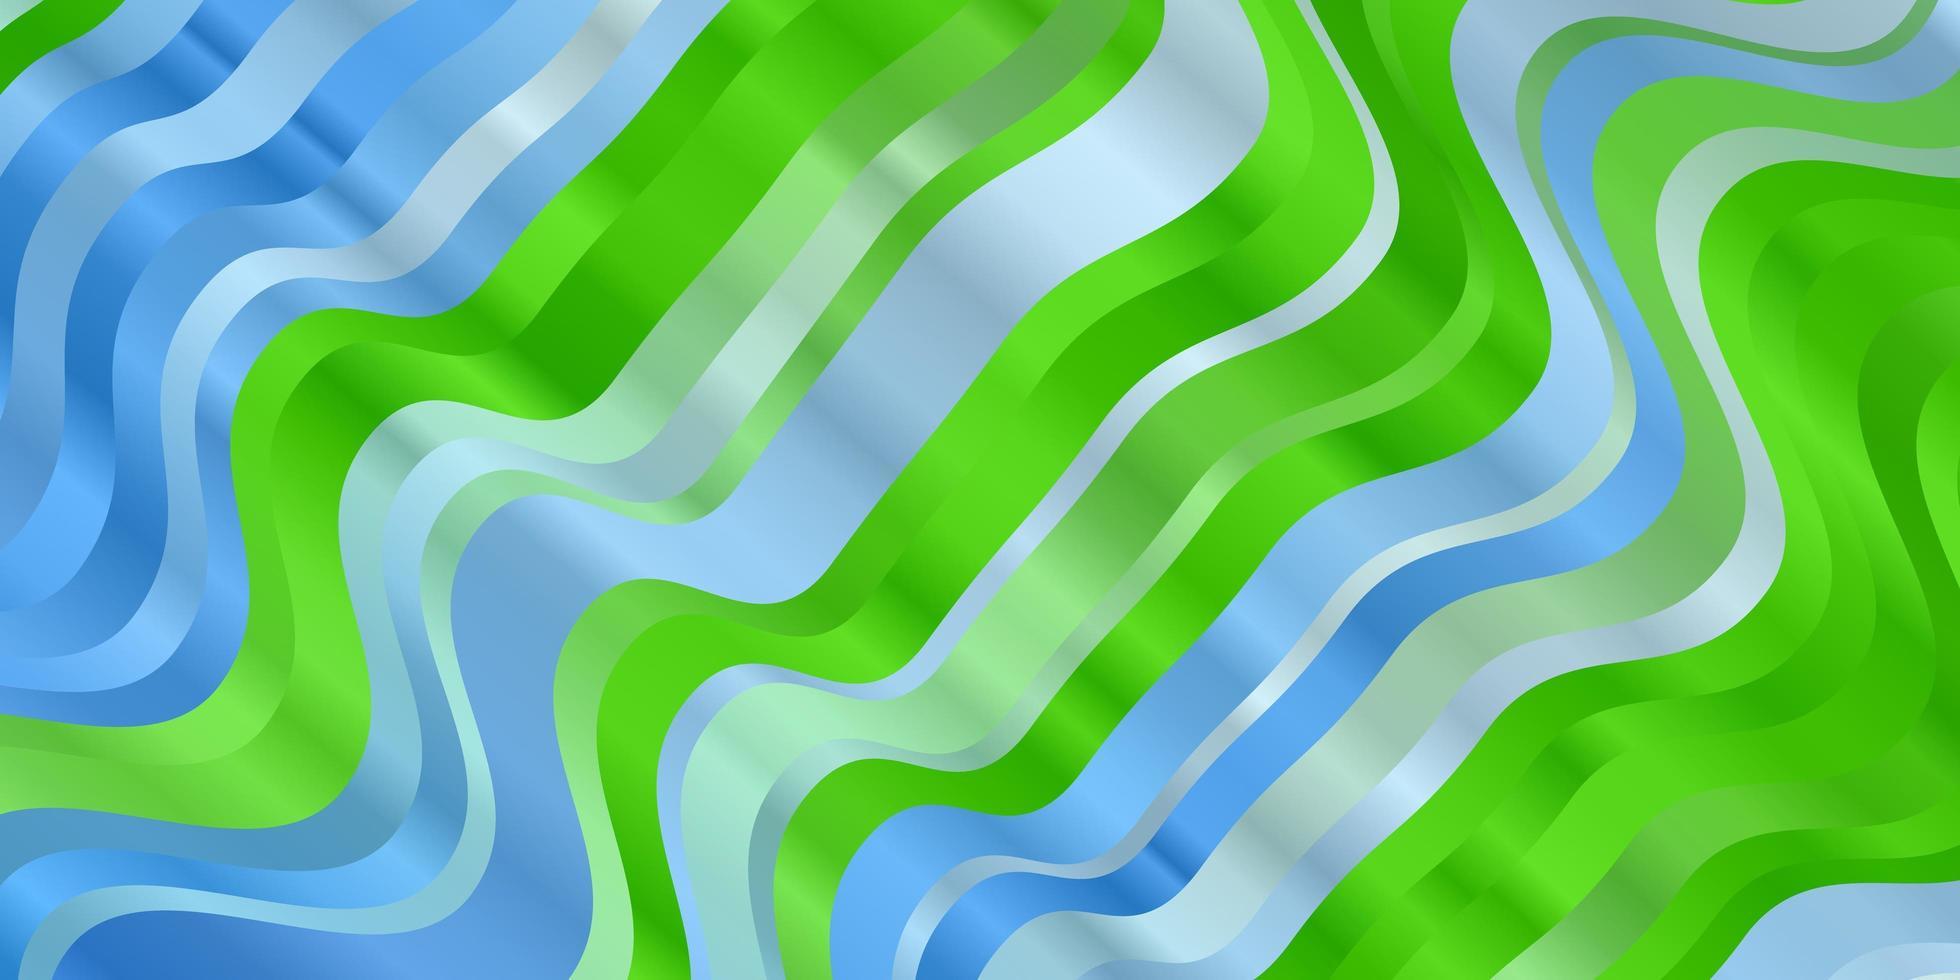 patrón de vector azul claro, verde con líneas torcidas.